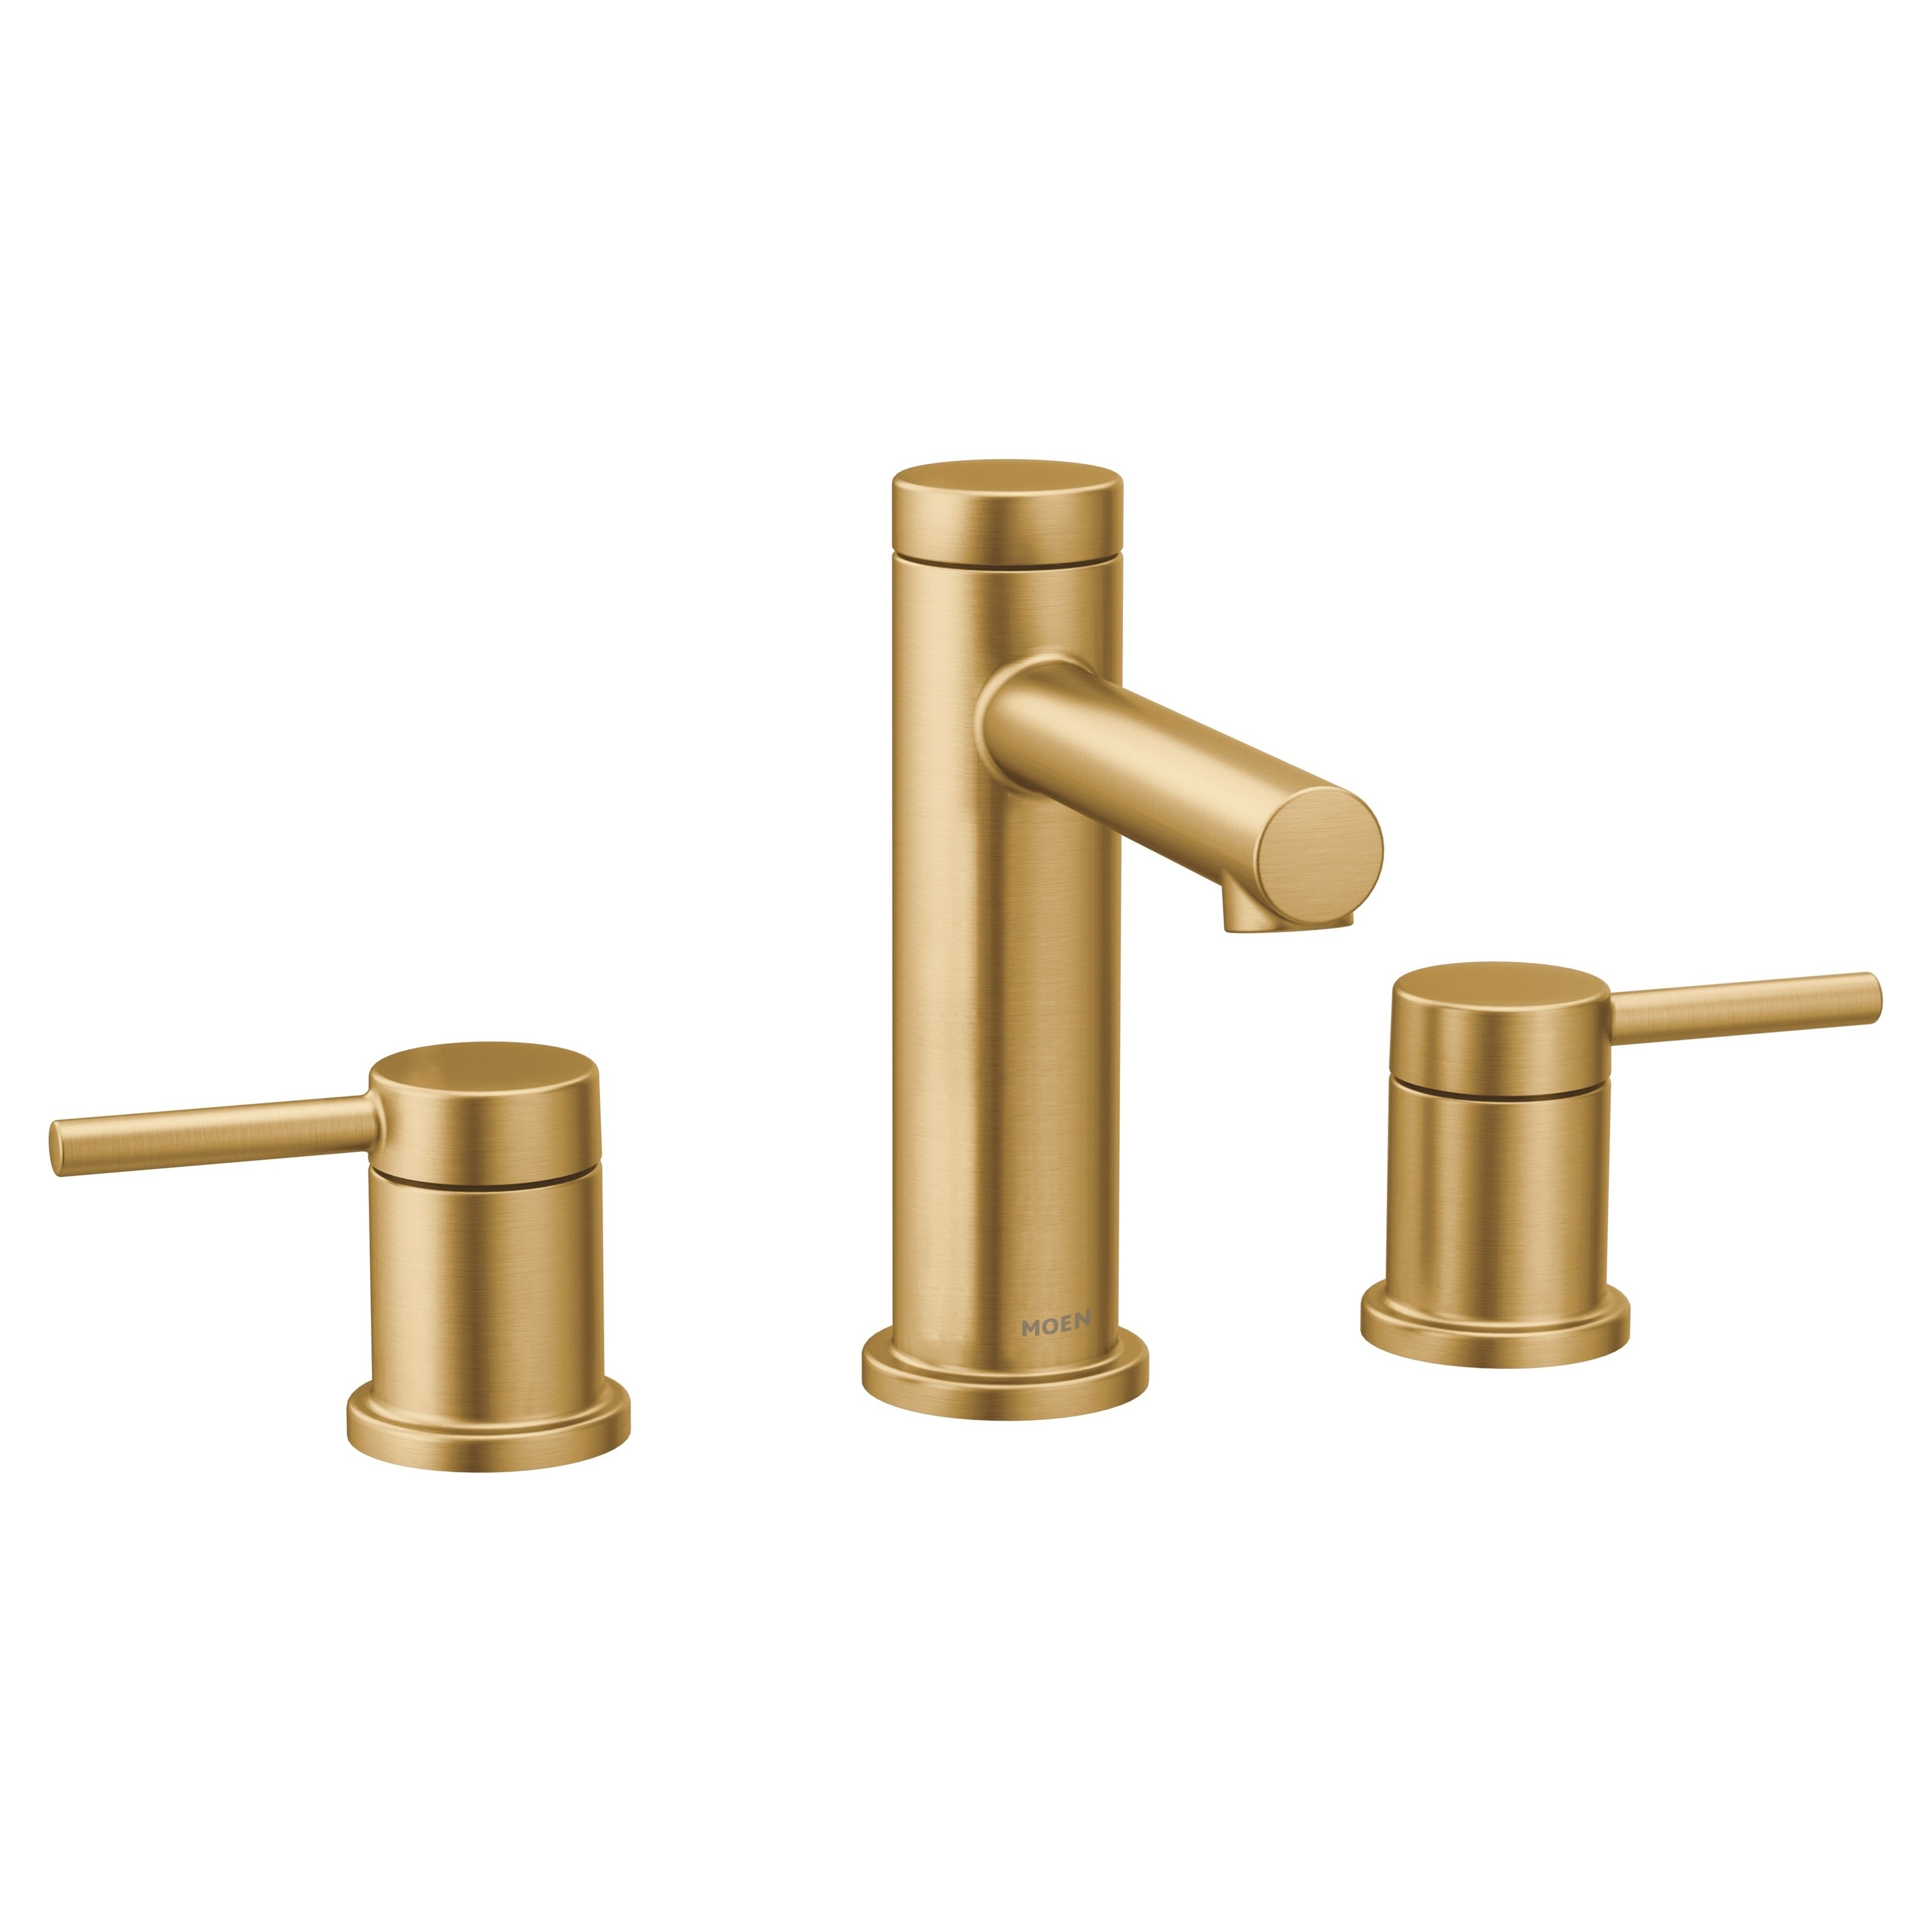 Shop Black Friday Deals On Moen Two Handle Bathroom Faucet Brushed Gold T6193bg Overstock 27615827